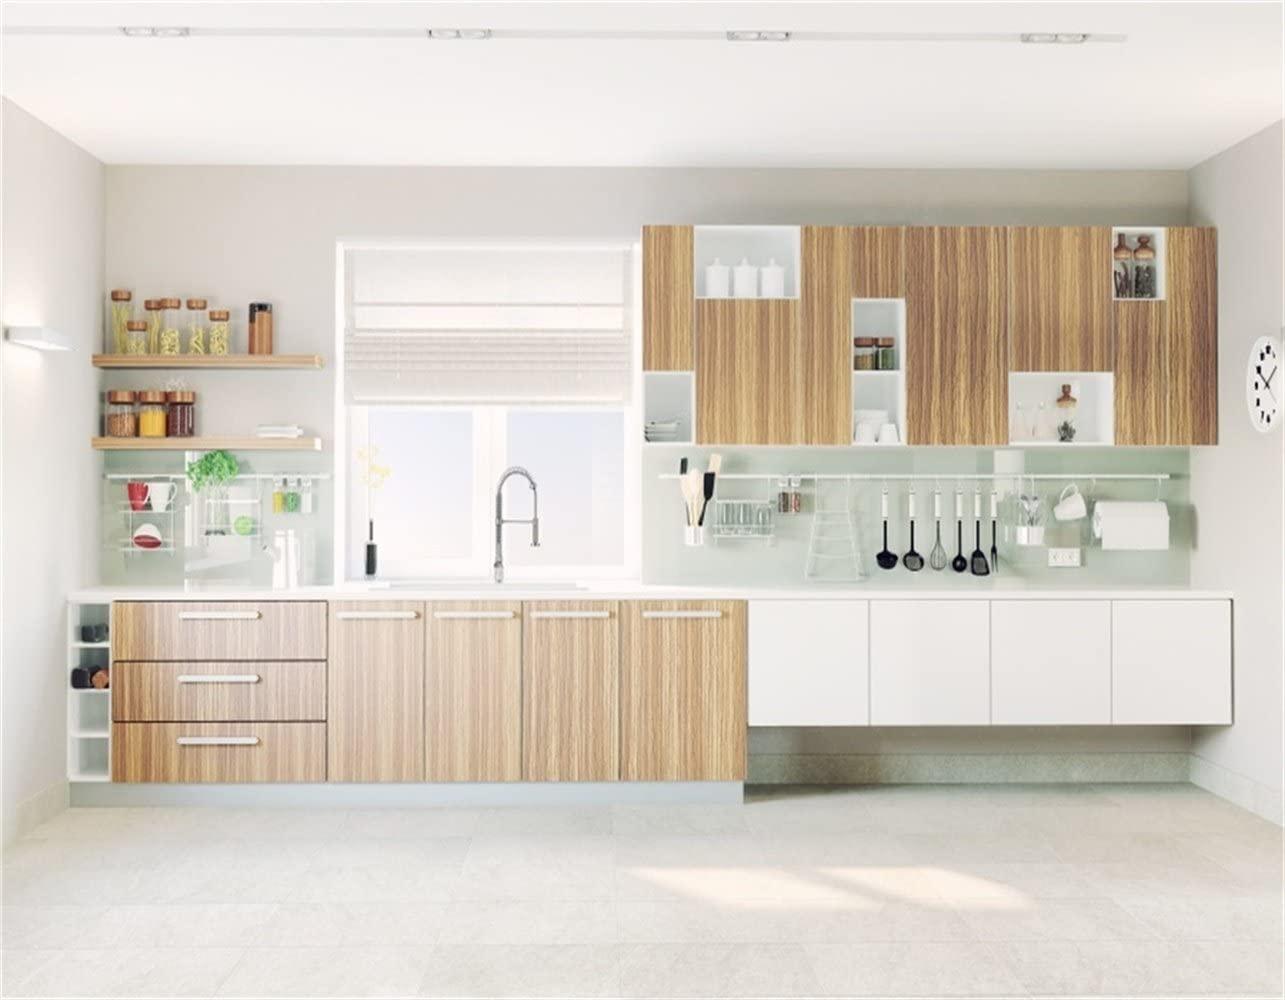 Amazoncom AOFOTO 10x8ft Modern Kitchen Interior Backdrop Sink 1285x1000